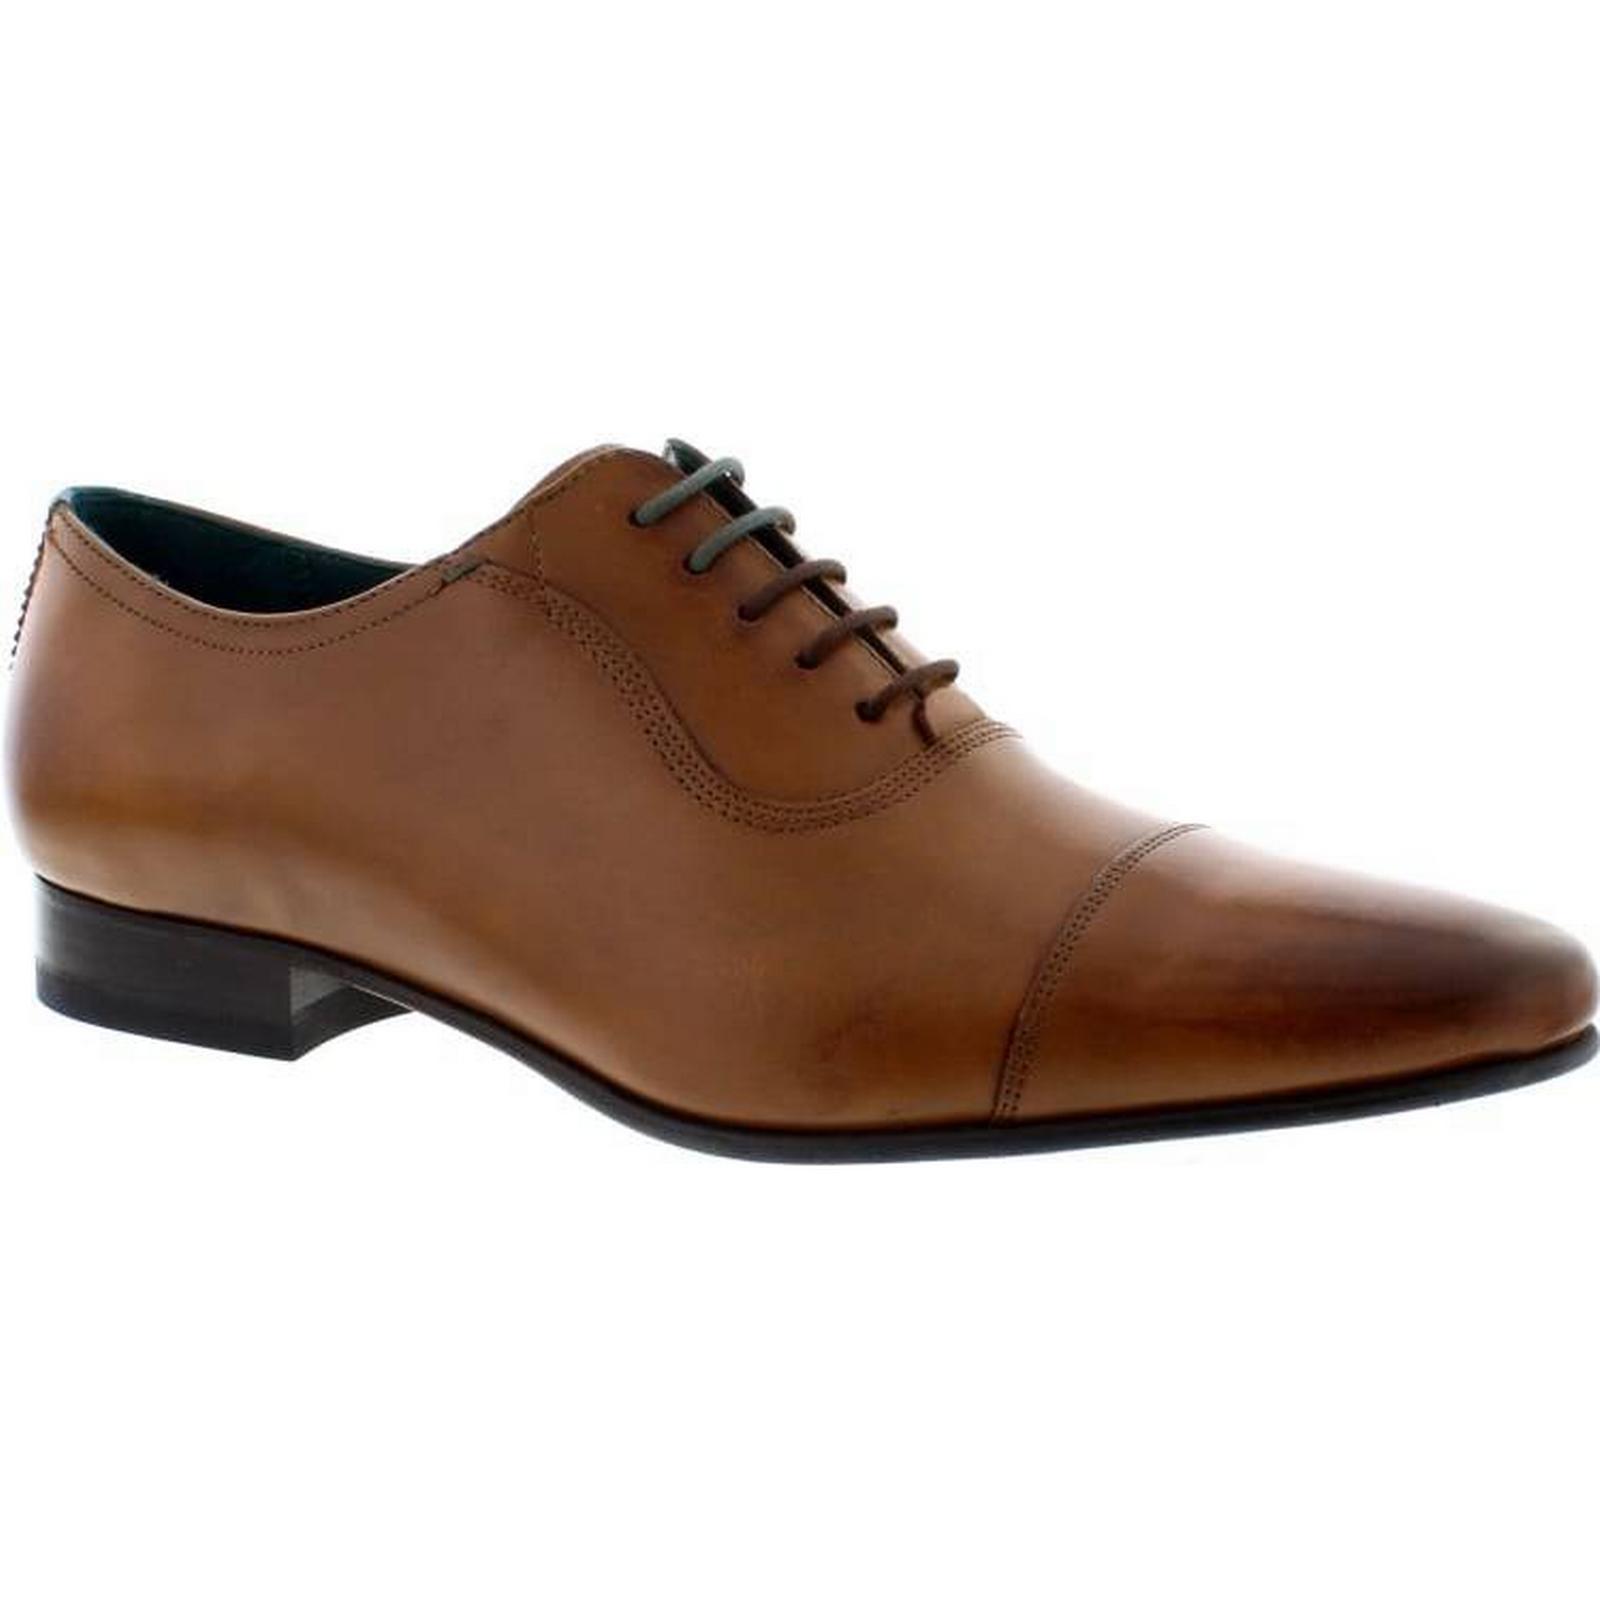 Ted Baker Leather Karney - Tan Leather Baker Size: 10 UK 523300